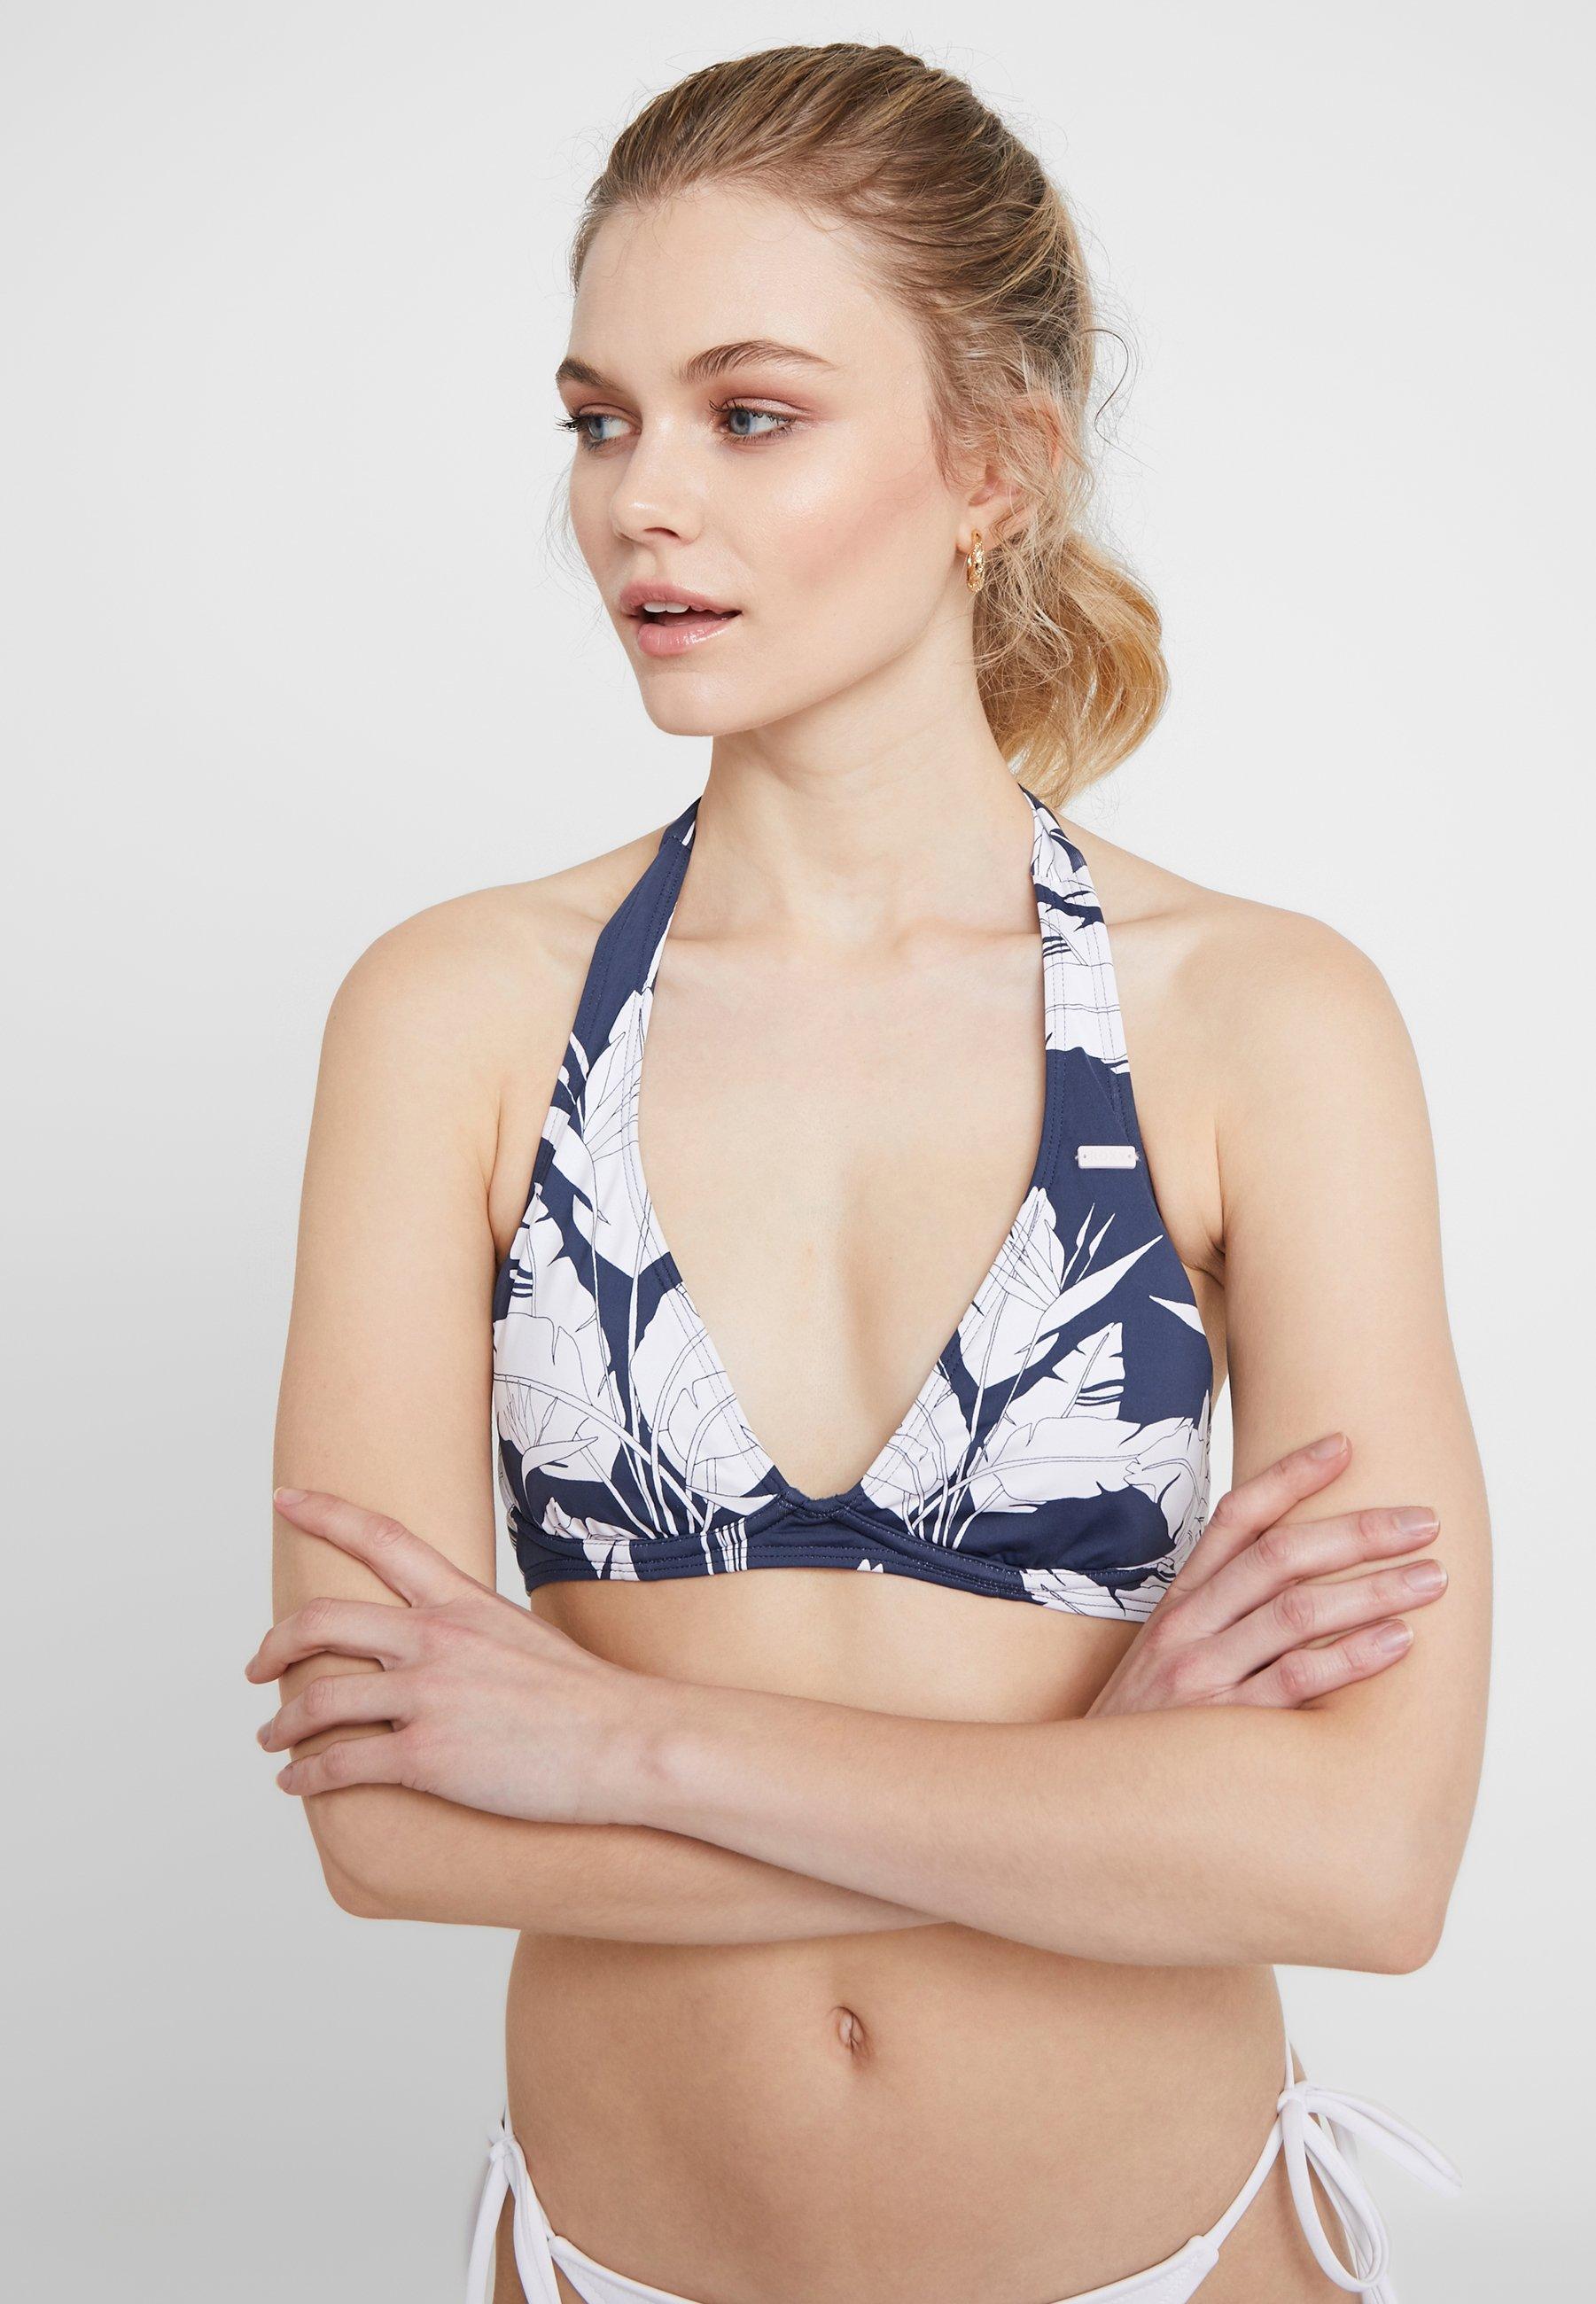 Women Bikini top